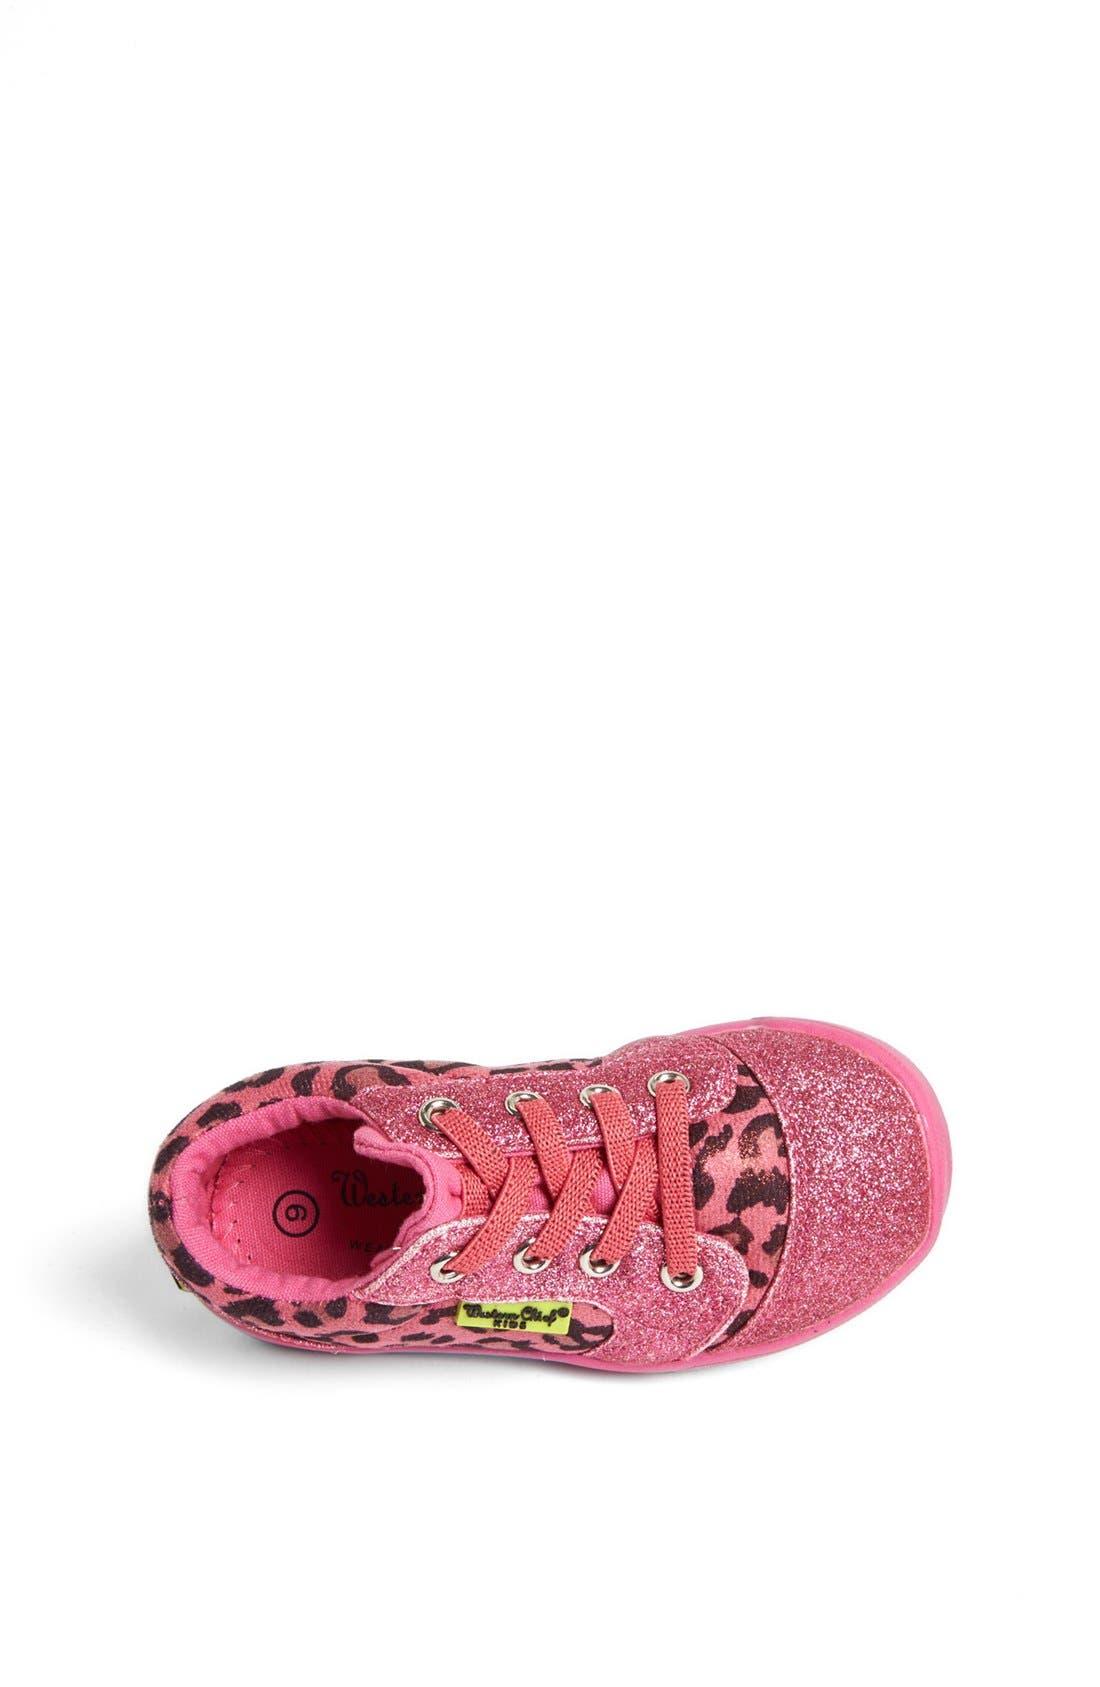 Alternate Image 3  - Western Chief 'Flashy Leopard' Sneaker (Walker & Toddler)